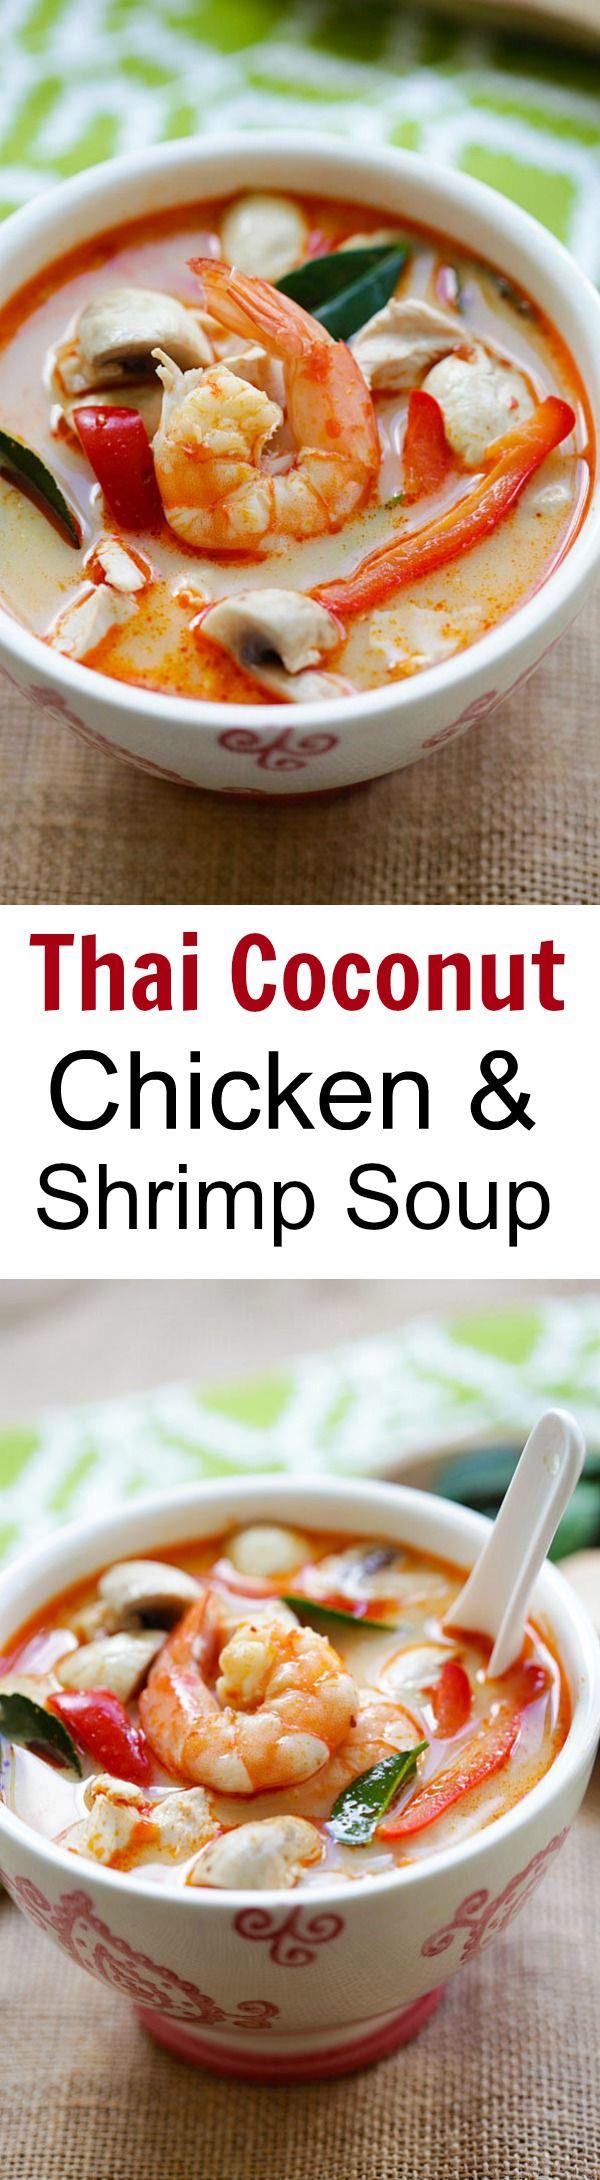 Thai Coconut Chicken and Shrimp Soup | Recept | Räkor, Mat ...